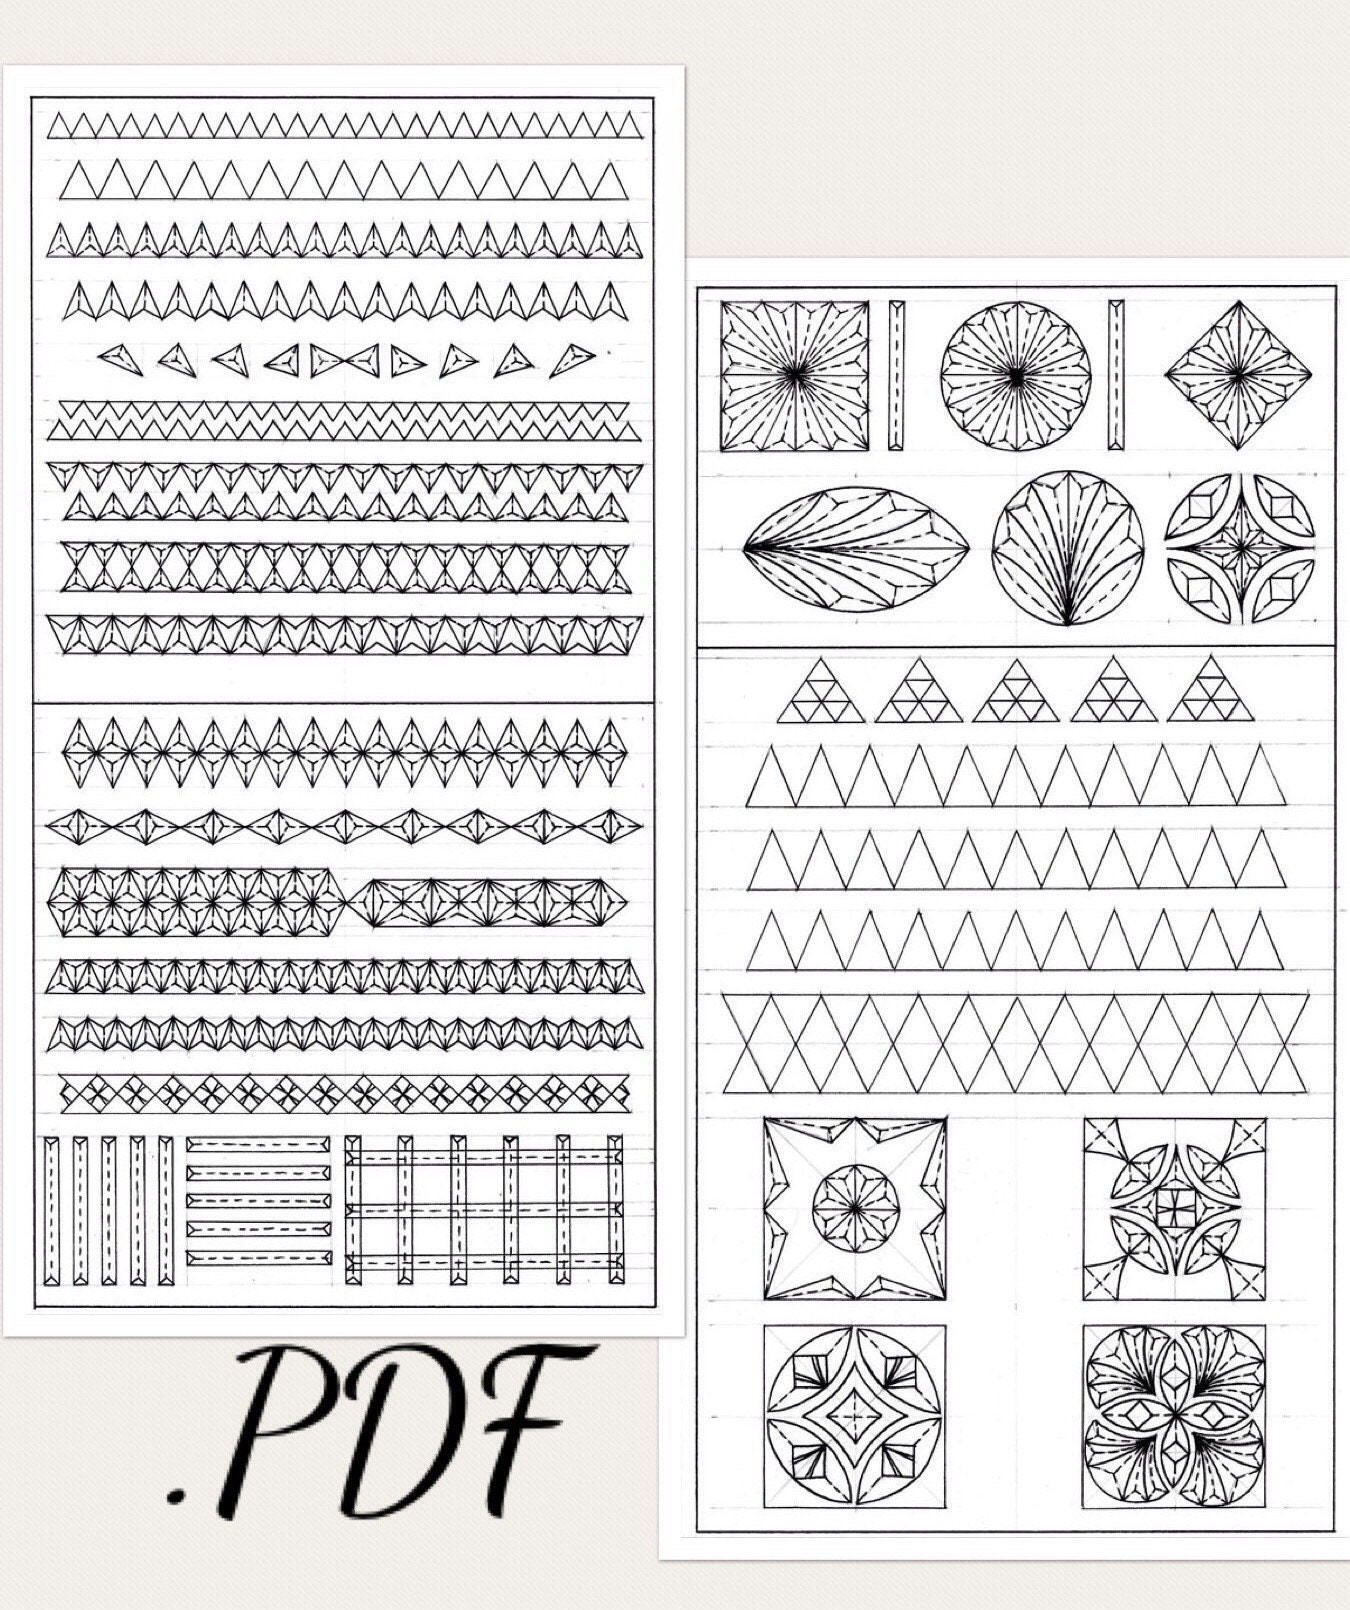 Pdf digital download practice basswood board patterns etsy